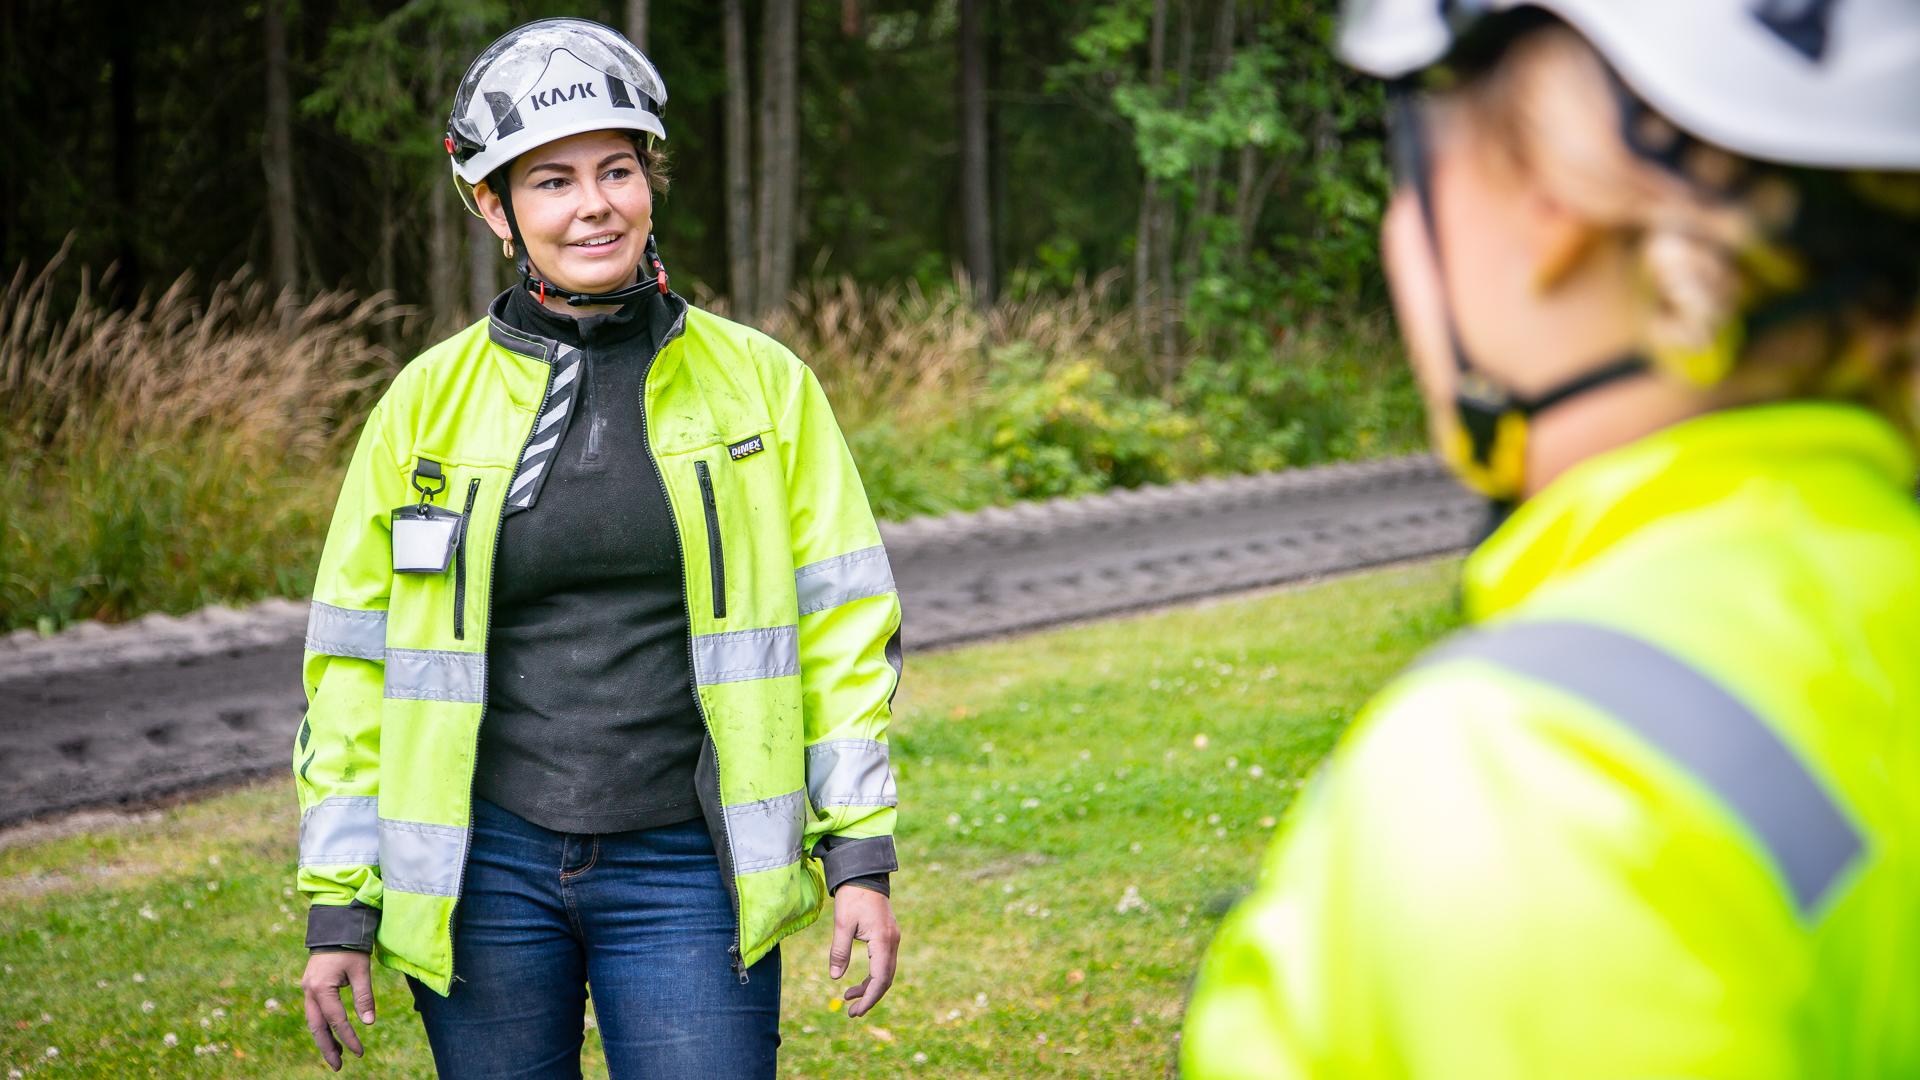 Business Tampere - Ecolan, Jenni Nurmi. Photo: Mirella Mellonmaa